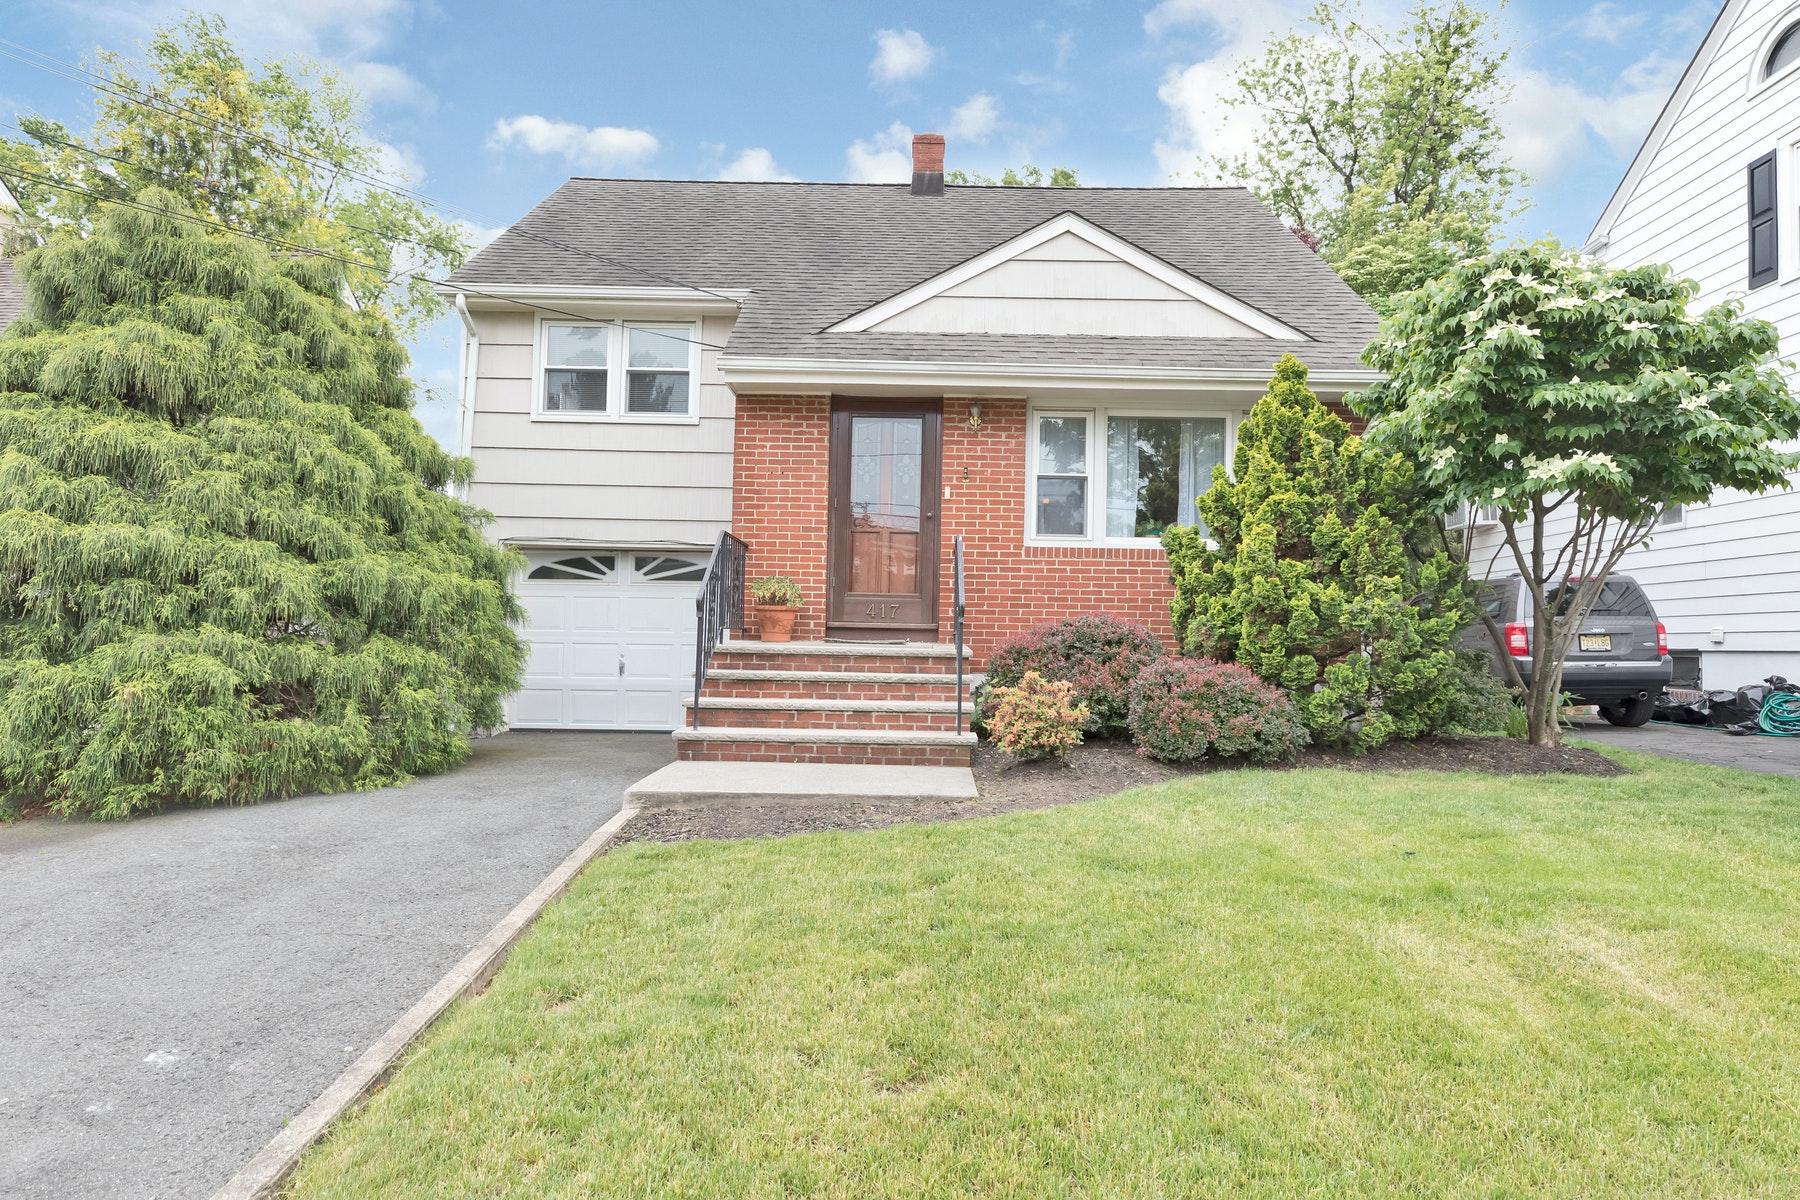 Single Family Homes por un Venta en A Commuter's Dream! 417 Beech Ave, Garwood, Nueva Jersey 07027 Estados Unidos